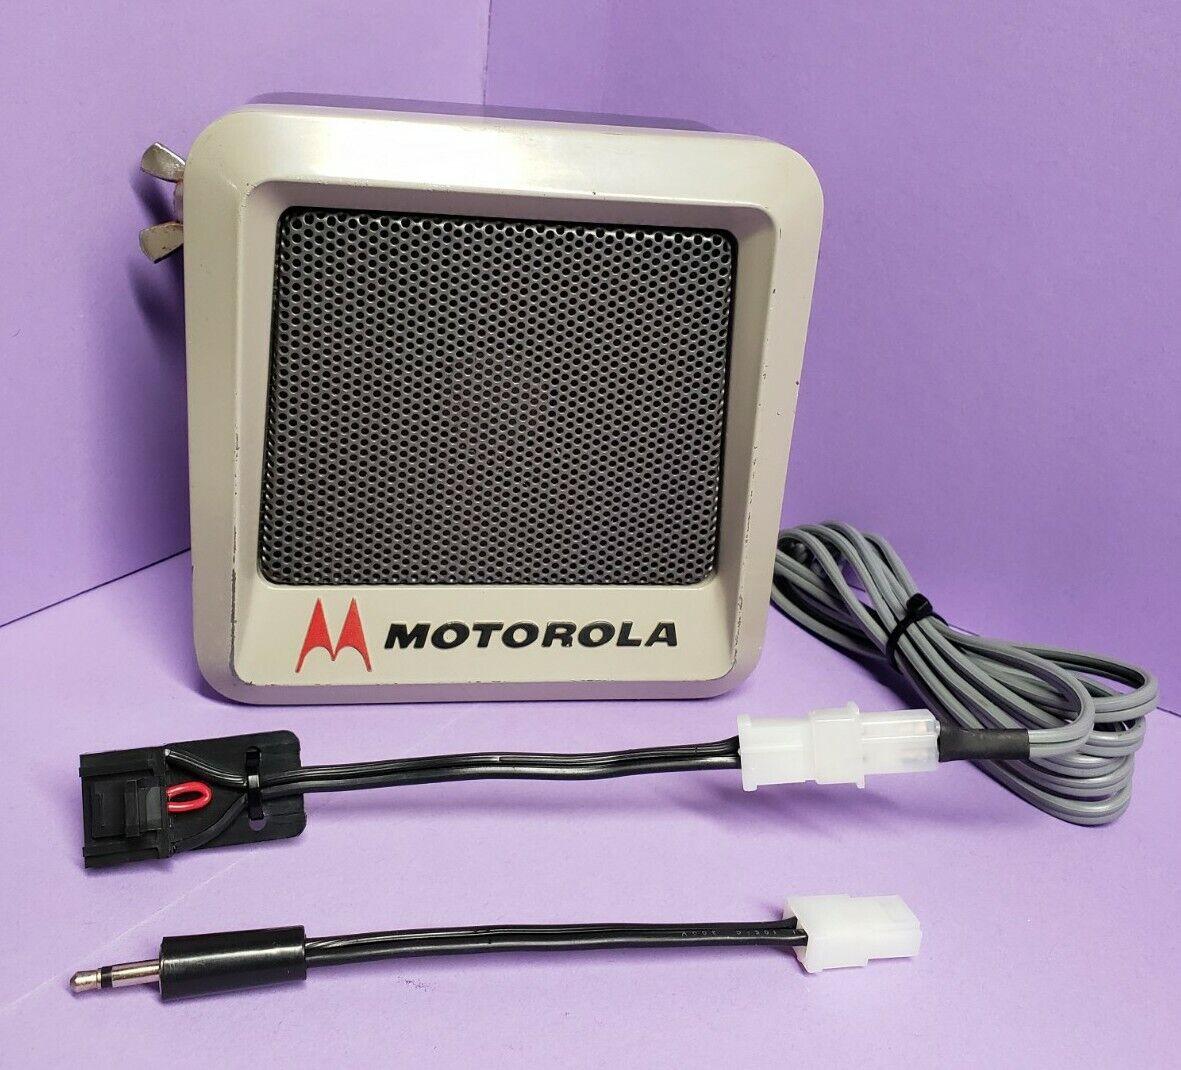 Motorola vintage speaker 16-Pin GM300 Maxtrac CDM1250 Radius XTL APX CM PM Grey. Buy it now for 150.00